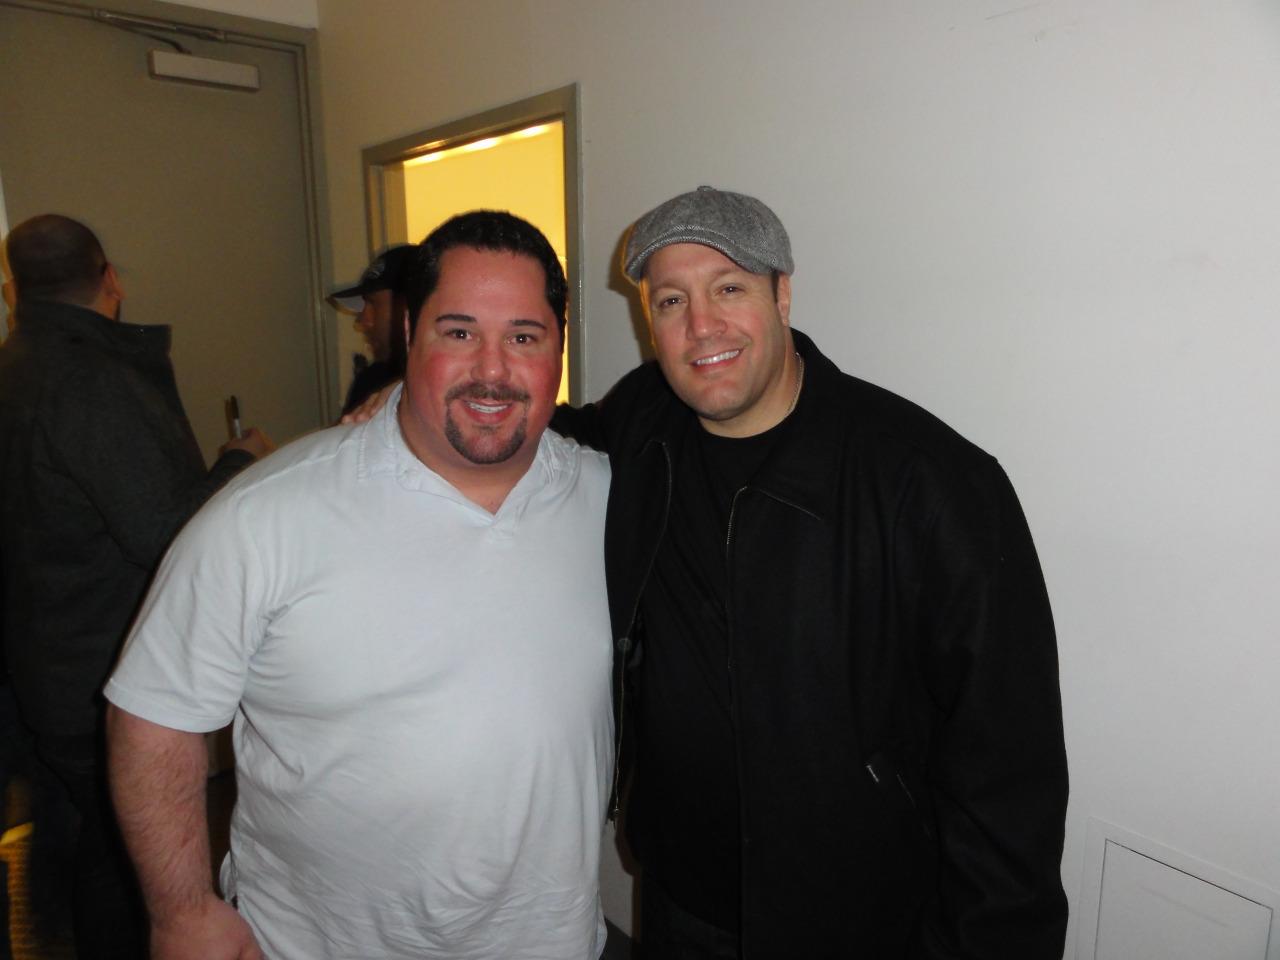 Kevin James and Geno